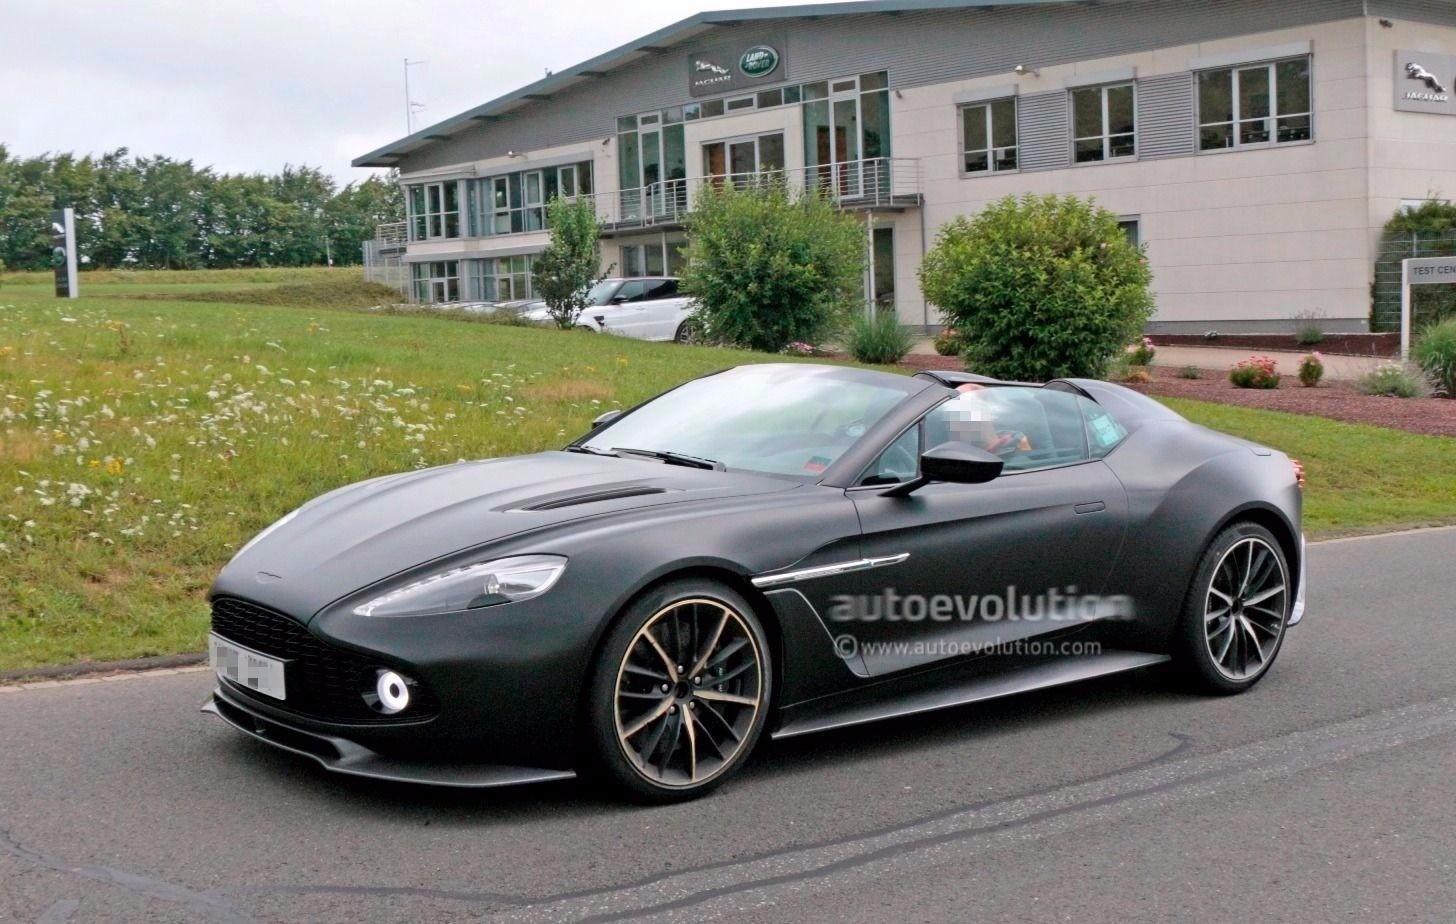 Spyshots Aston Martin Vanquish Zagato Speedster And